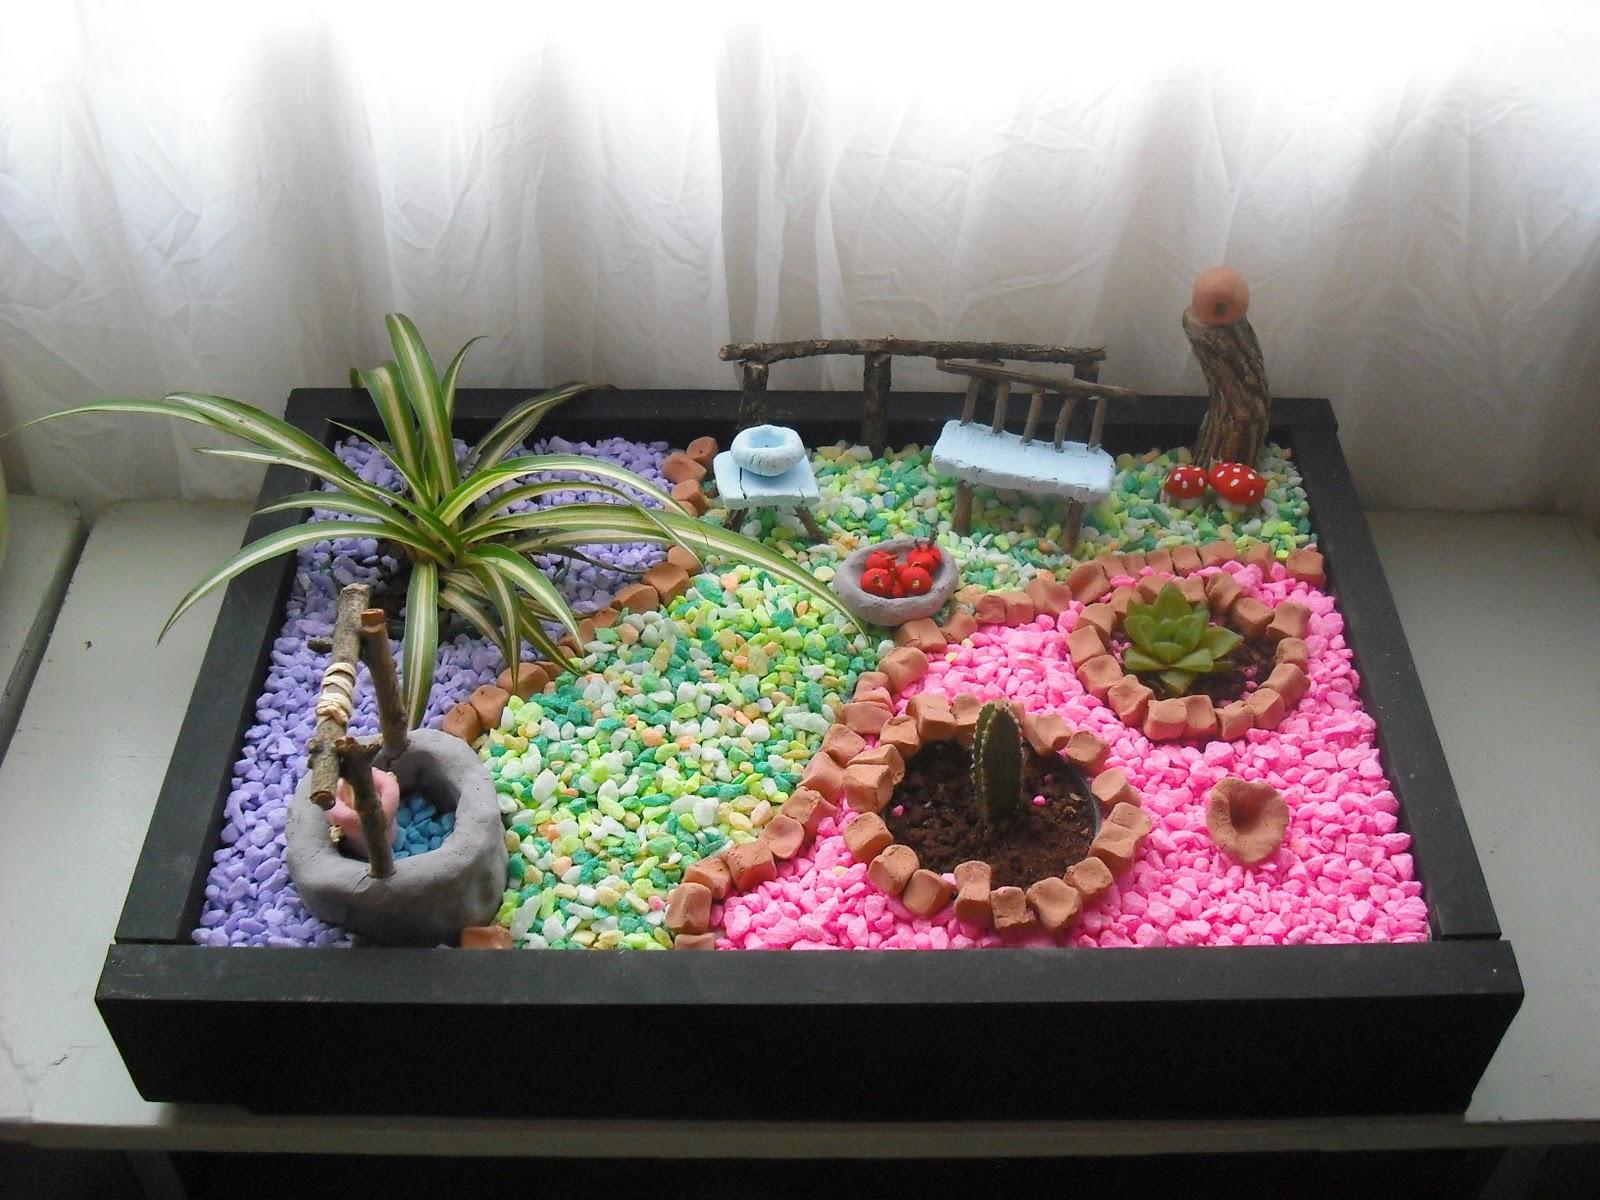 artesanato mini jardim : artesanato mini jardim:CASA'ART: MINI JARDIM II